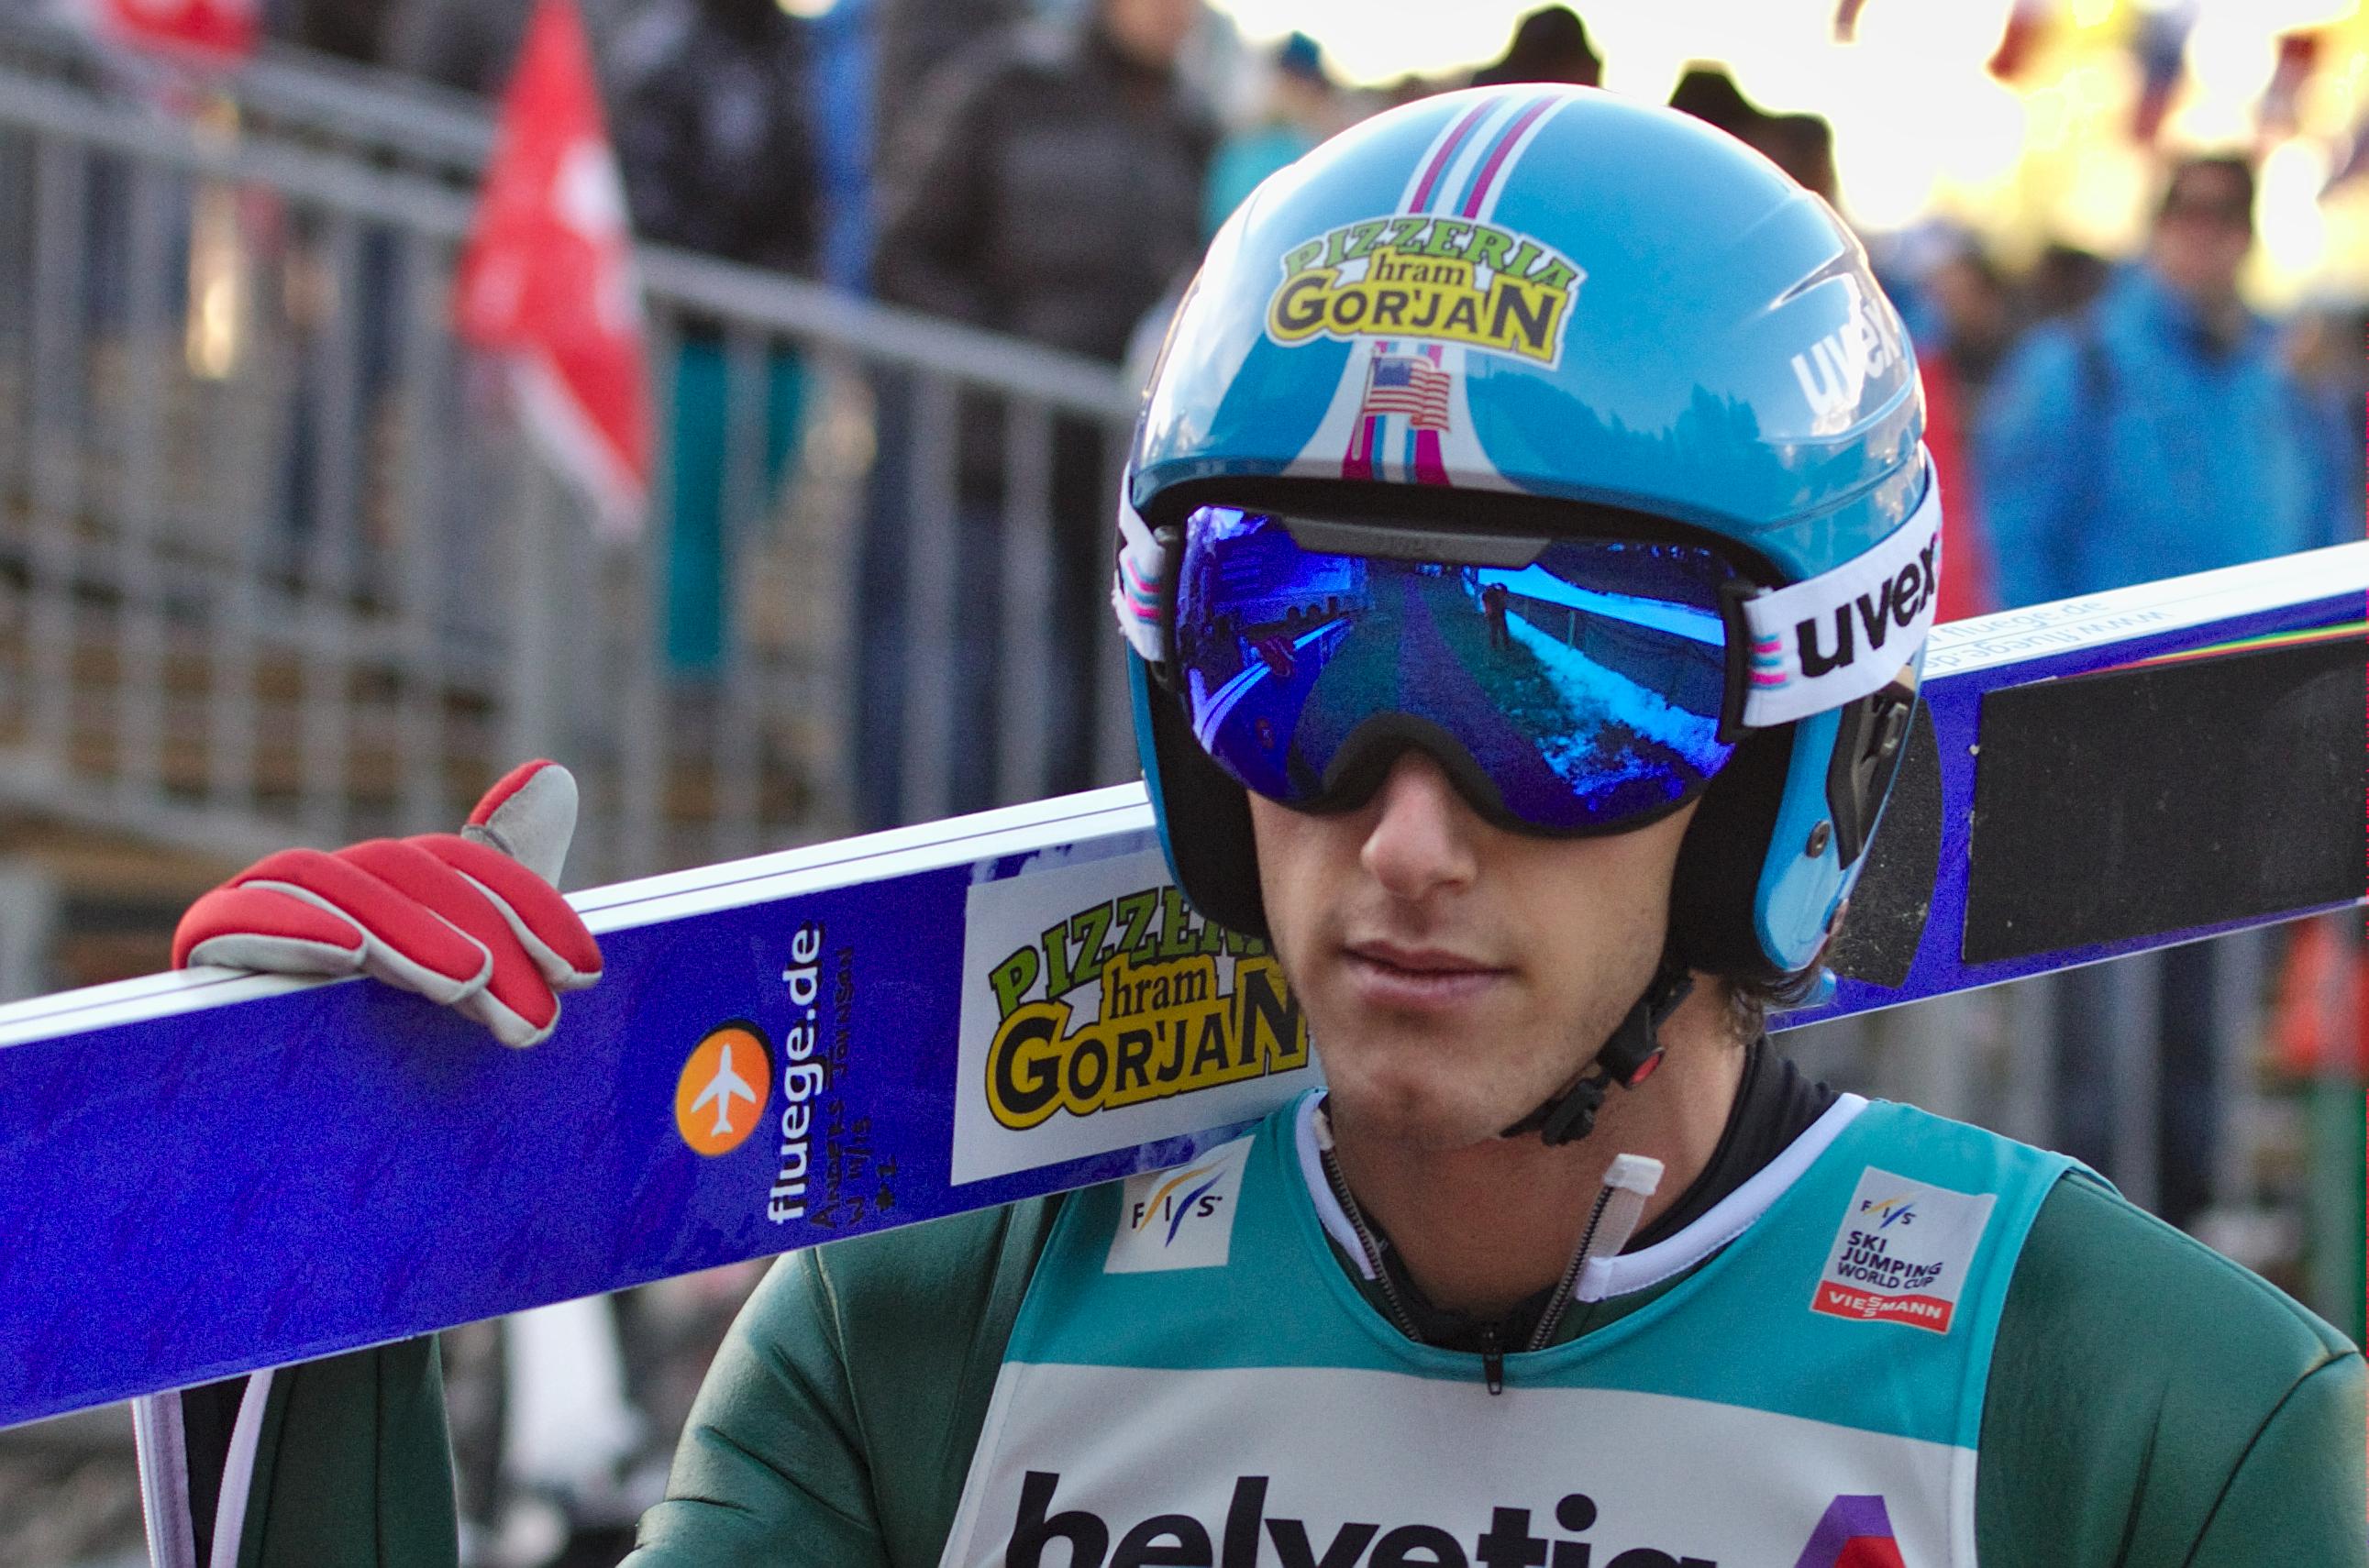 Anders Johnson Skispringer – Wikipedia